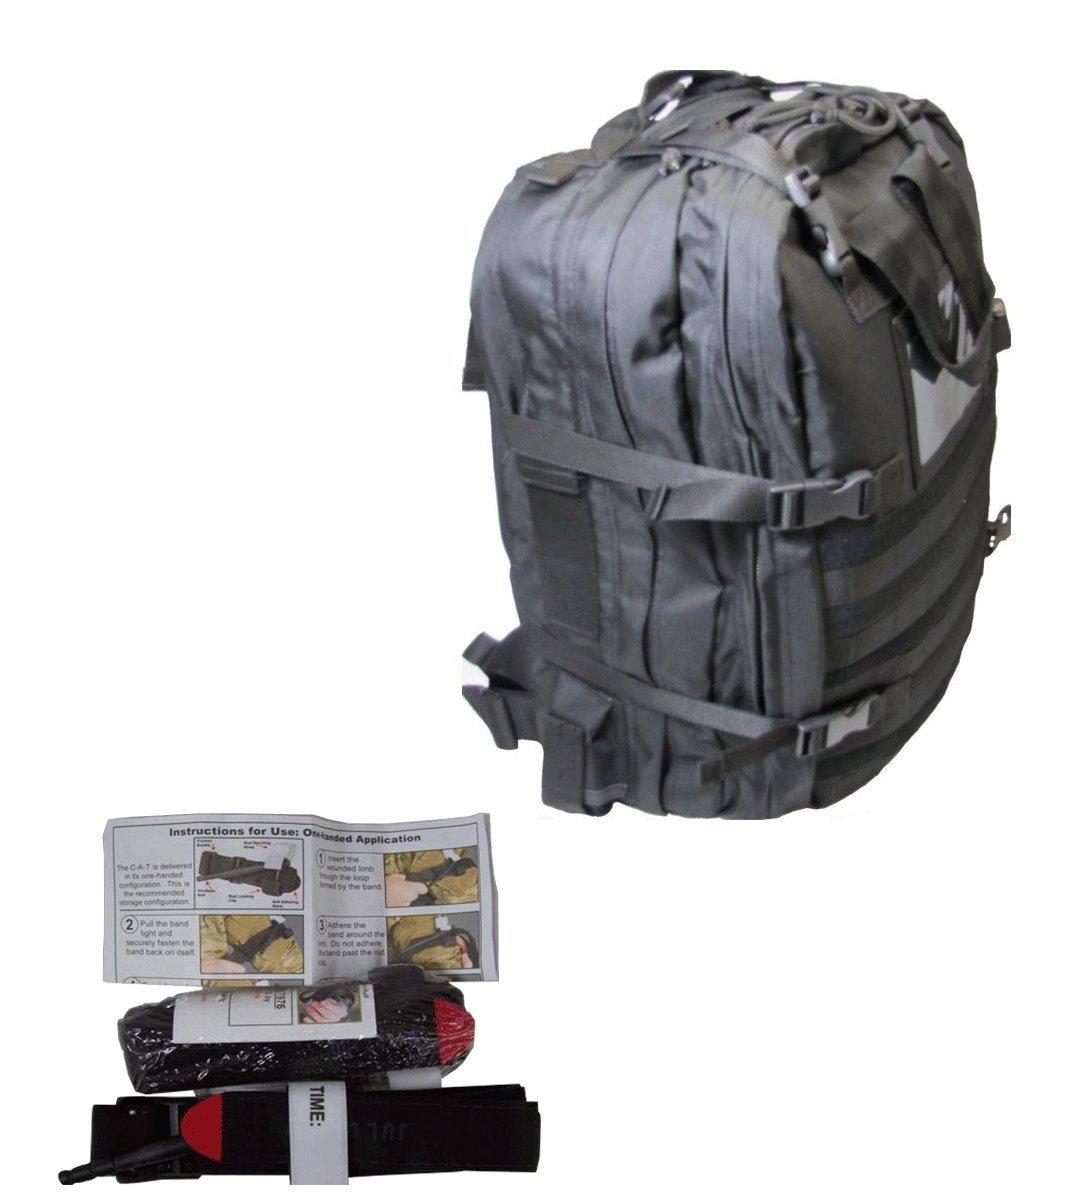 Medical Bags Fully Stocked - Stomp Medical Kit Bag With CAT Tourniquet Bundle-(Black)